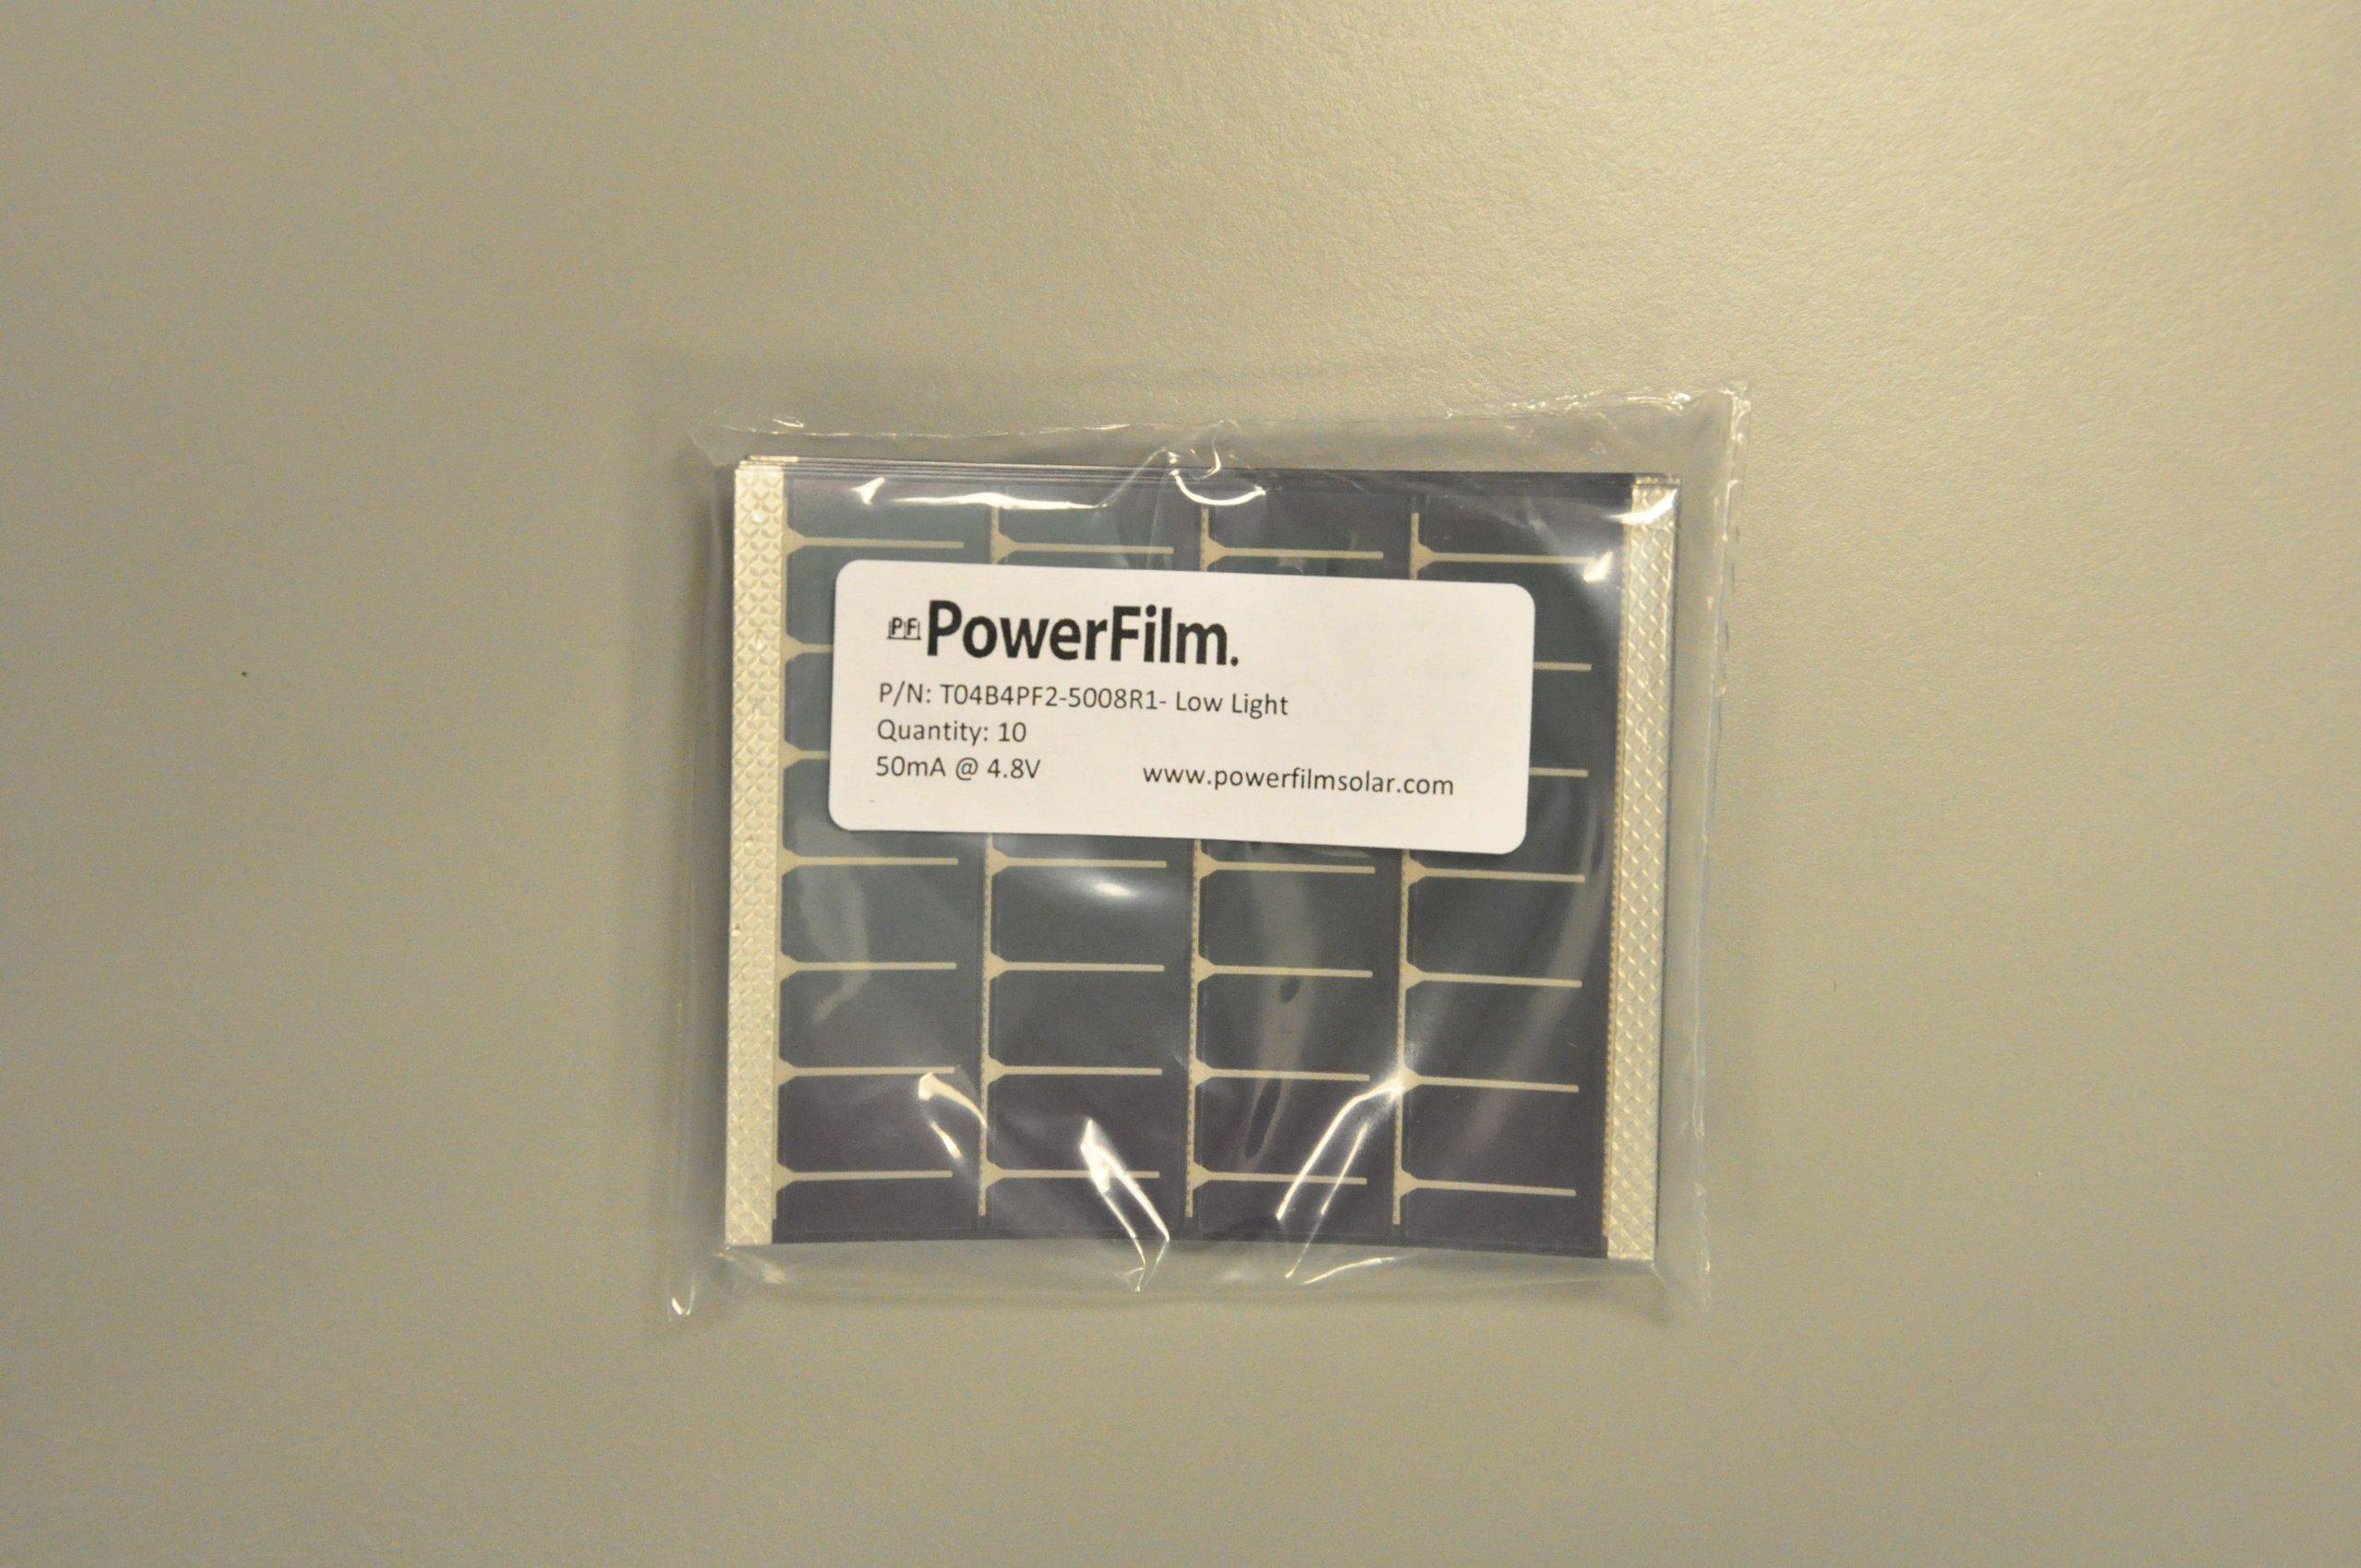 PF POWERFILM OEM Low-light Solar Module 50mA@4.8V (10/pkg) by PF POWERFILM